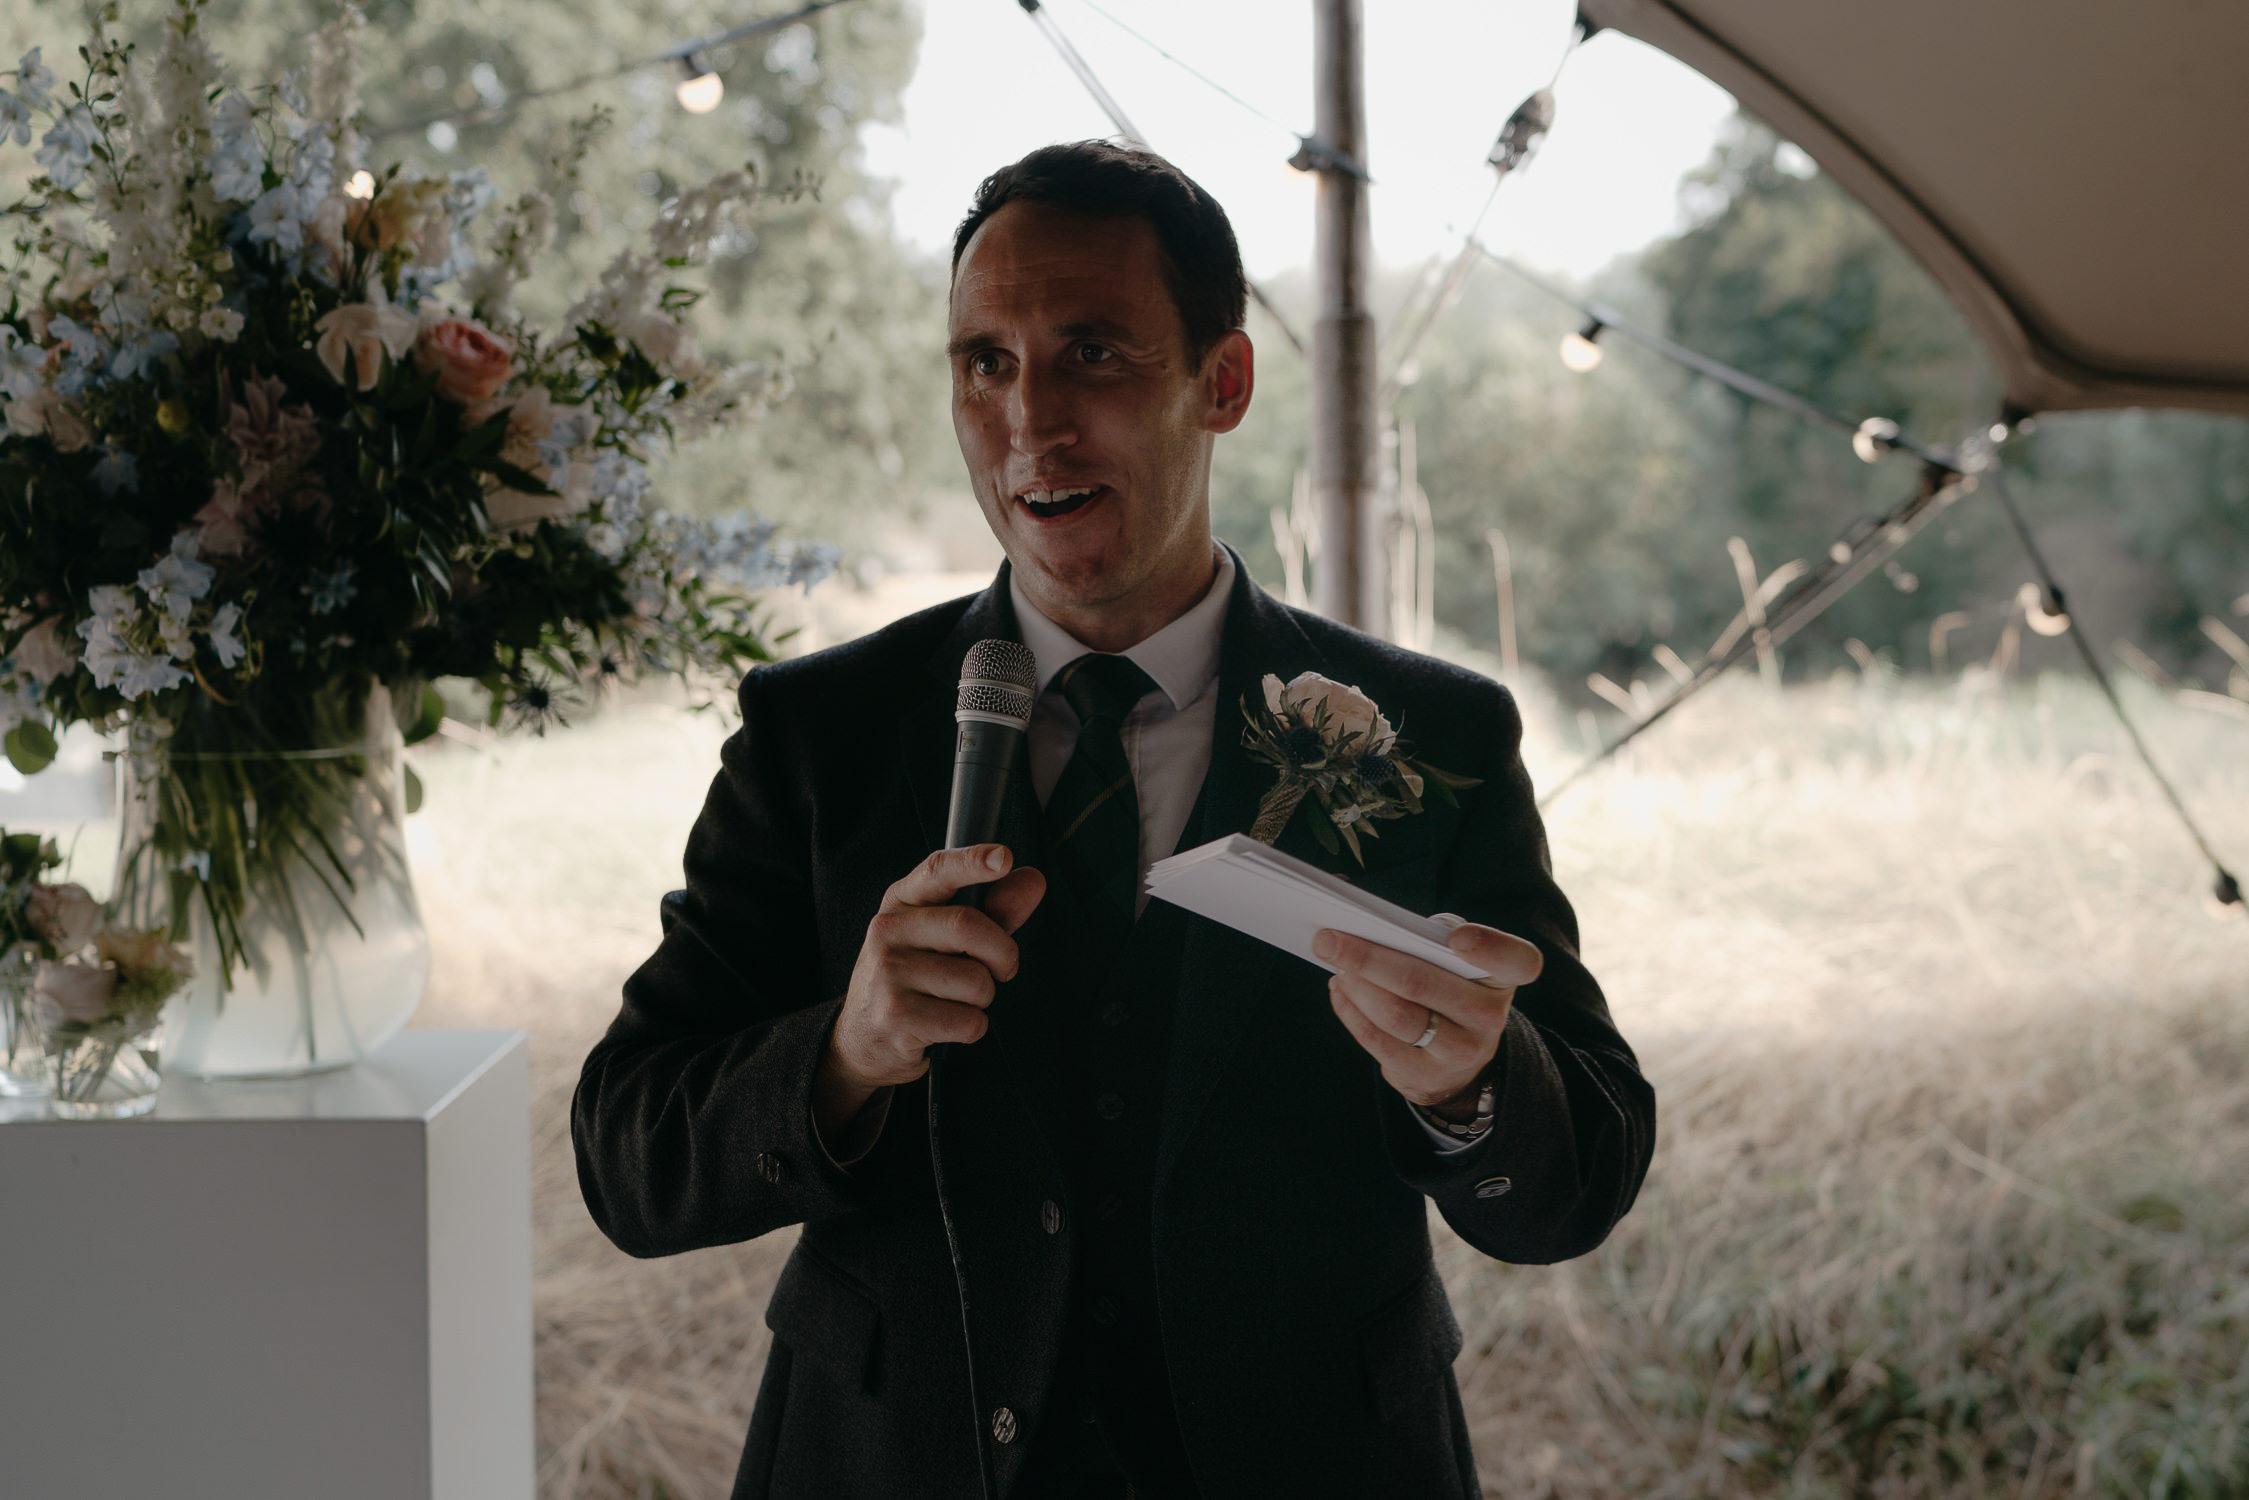 bruidsfotografie-trouwfotograaf-amsterdam-utrecht-mark-hadden-Laura-Craig-342.jpg